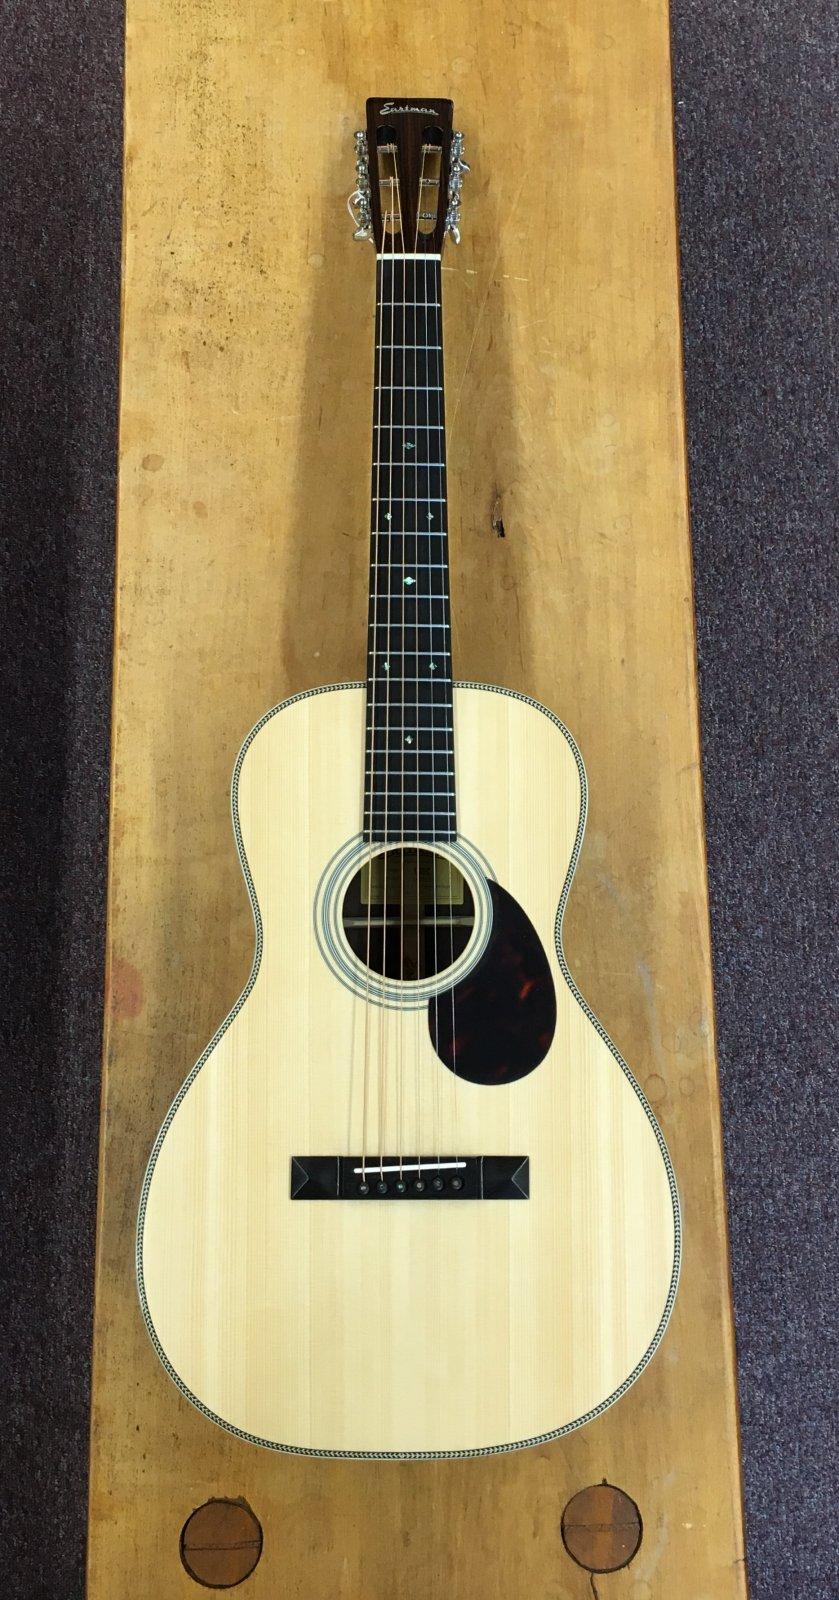 Eastman E20P Parlor Guitar